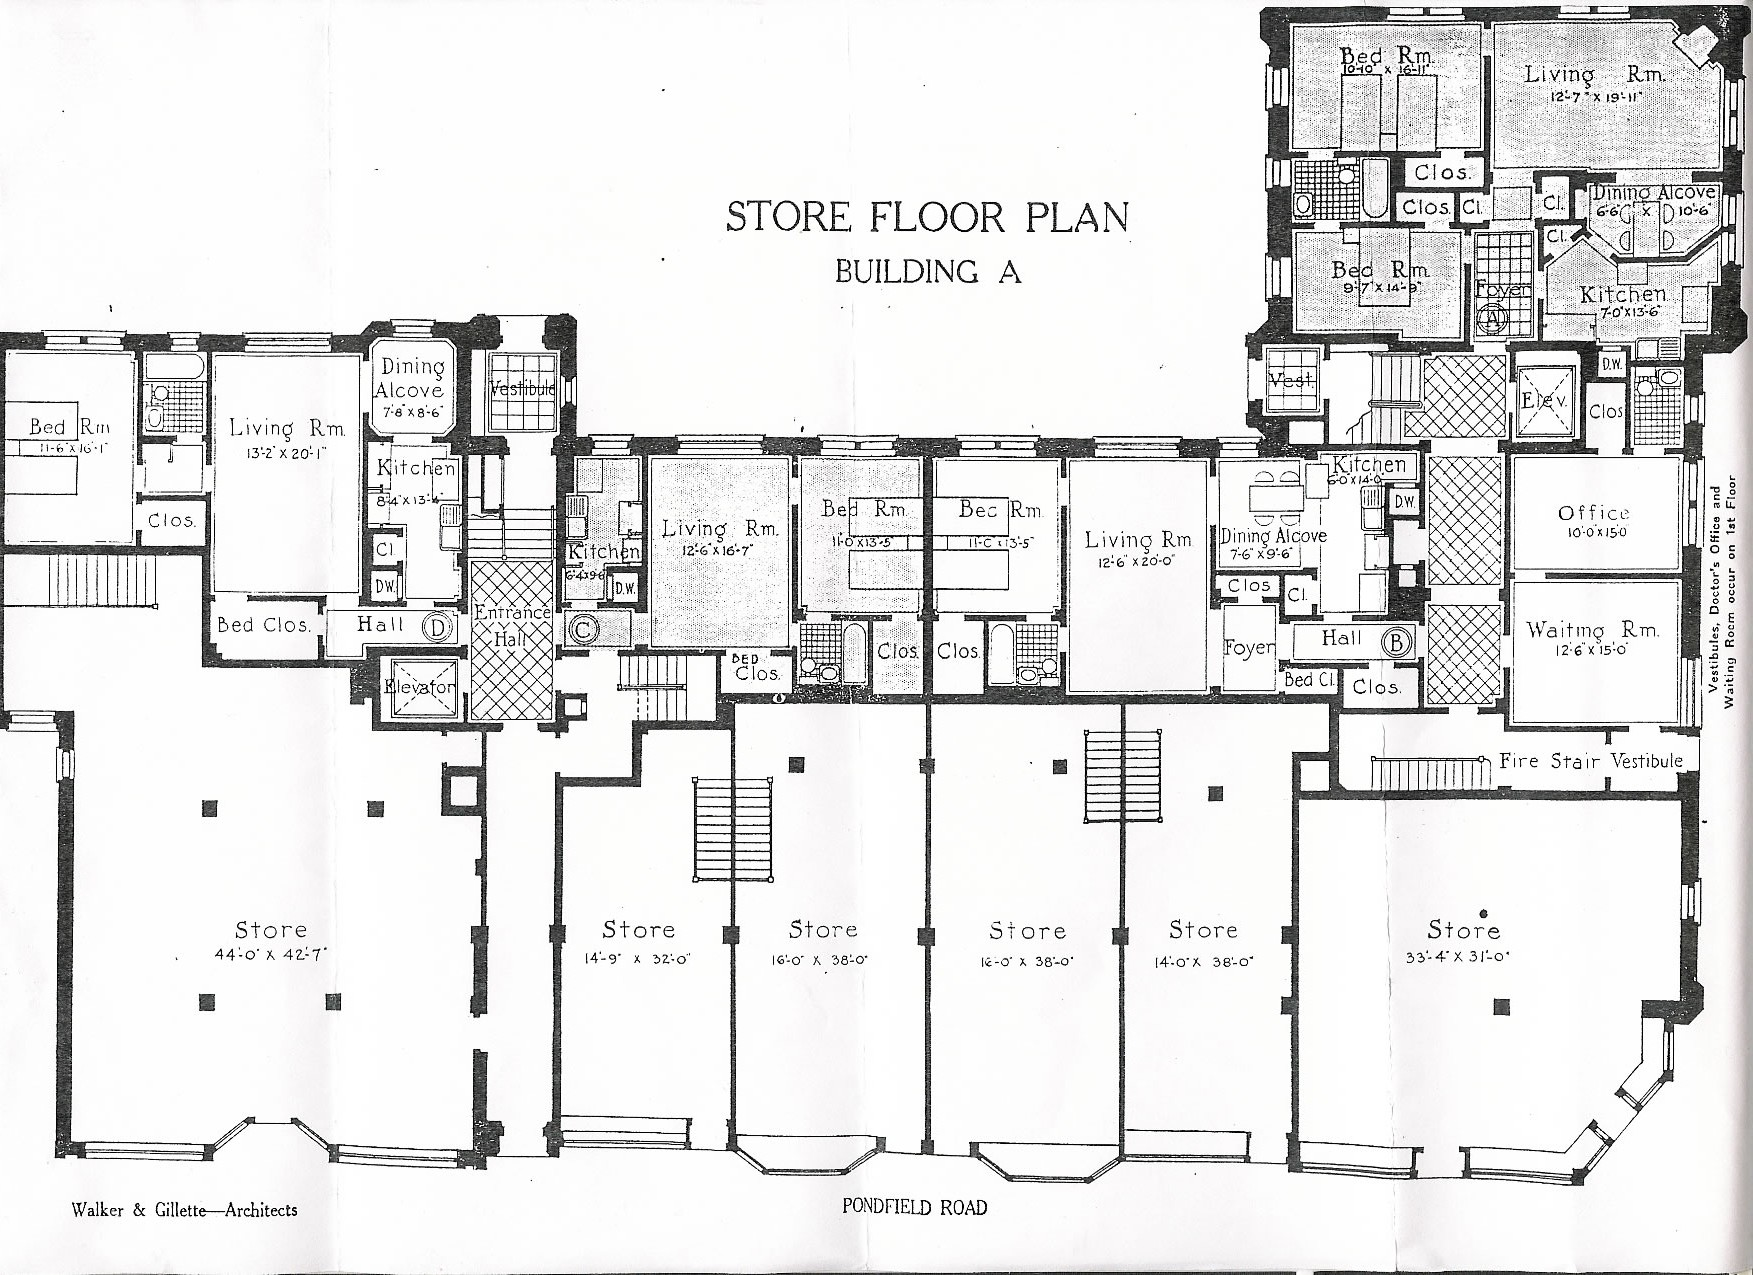 Floor Plan Of esidential Building - ^ Build Floorplan. Building Floorplans  he Building Lorry I Lokey .